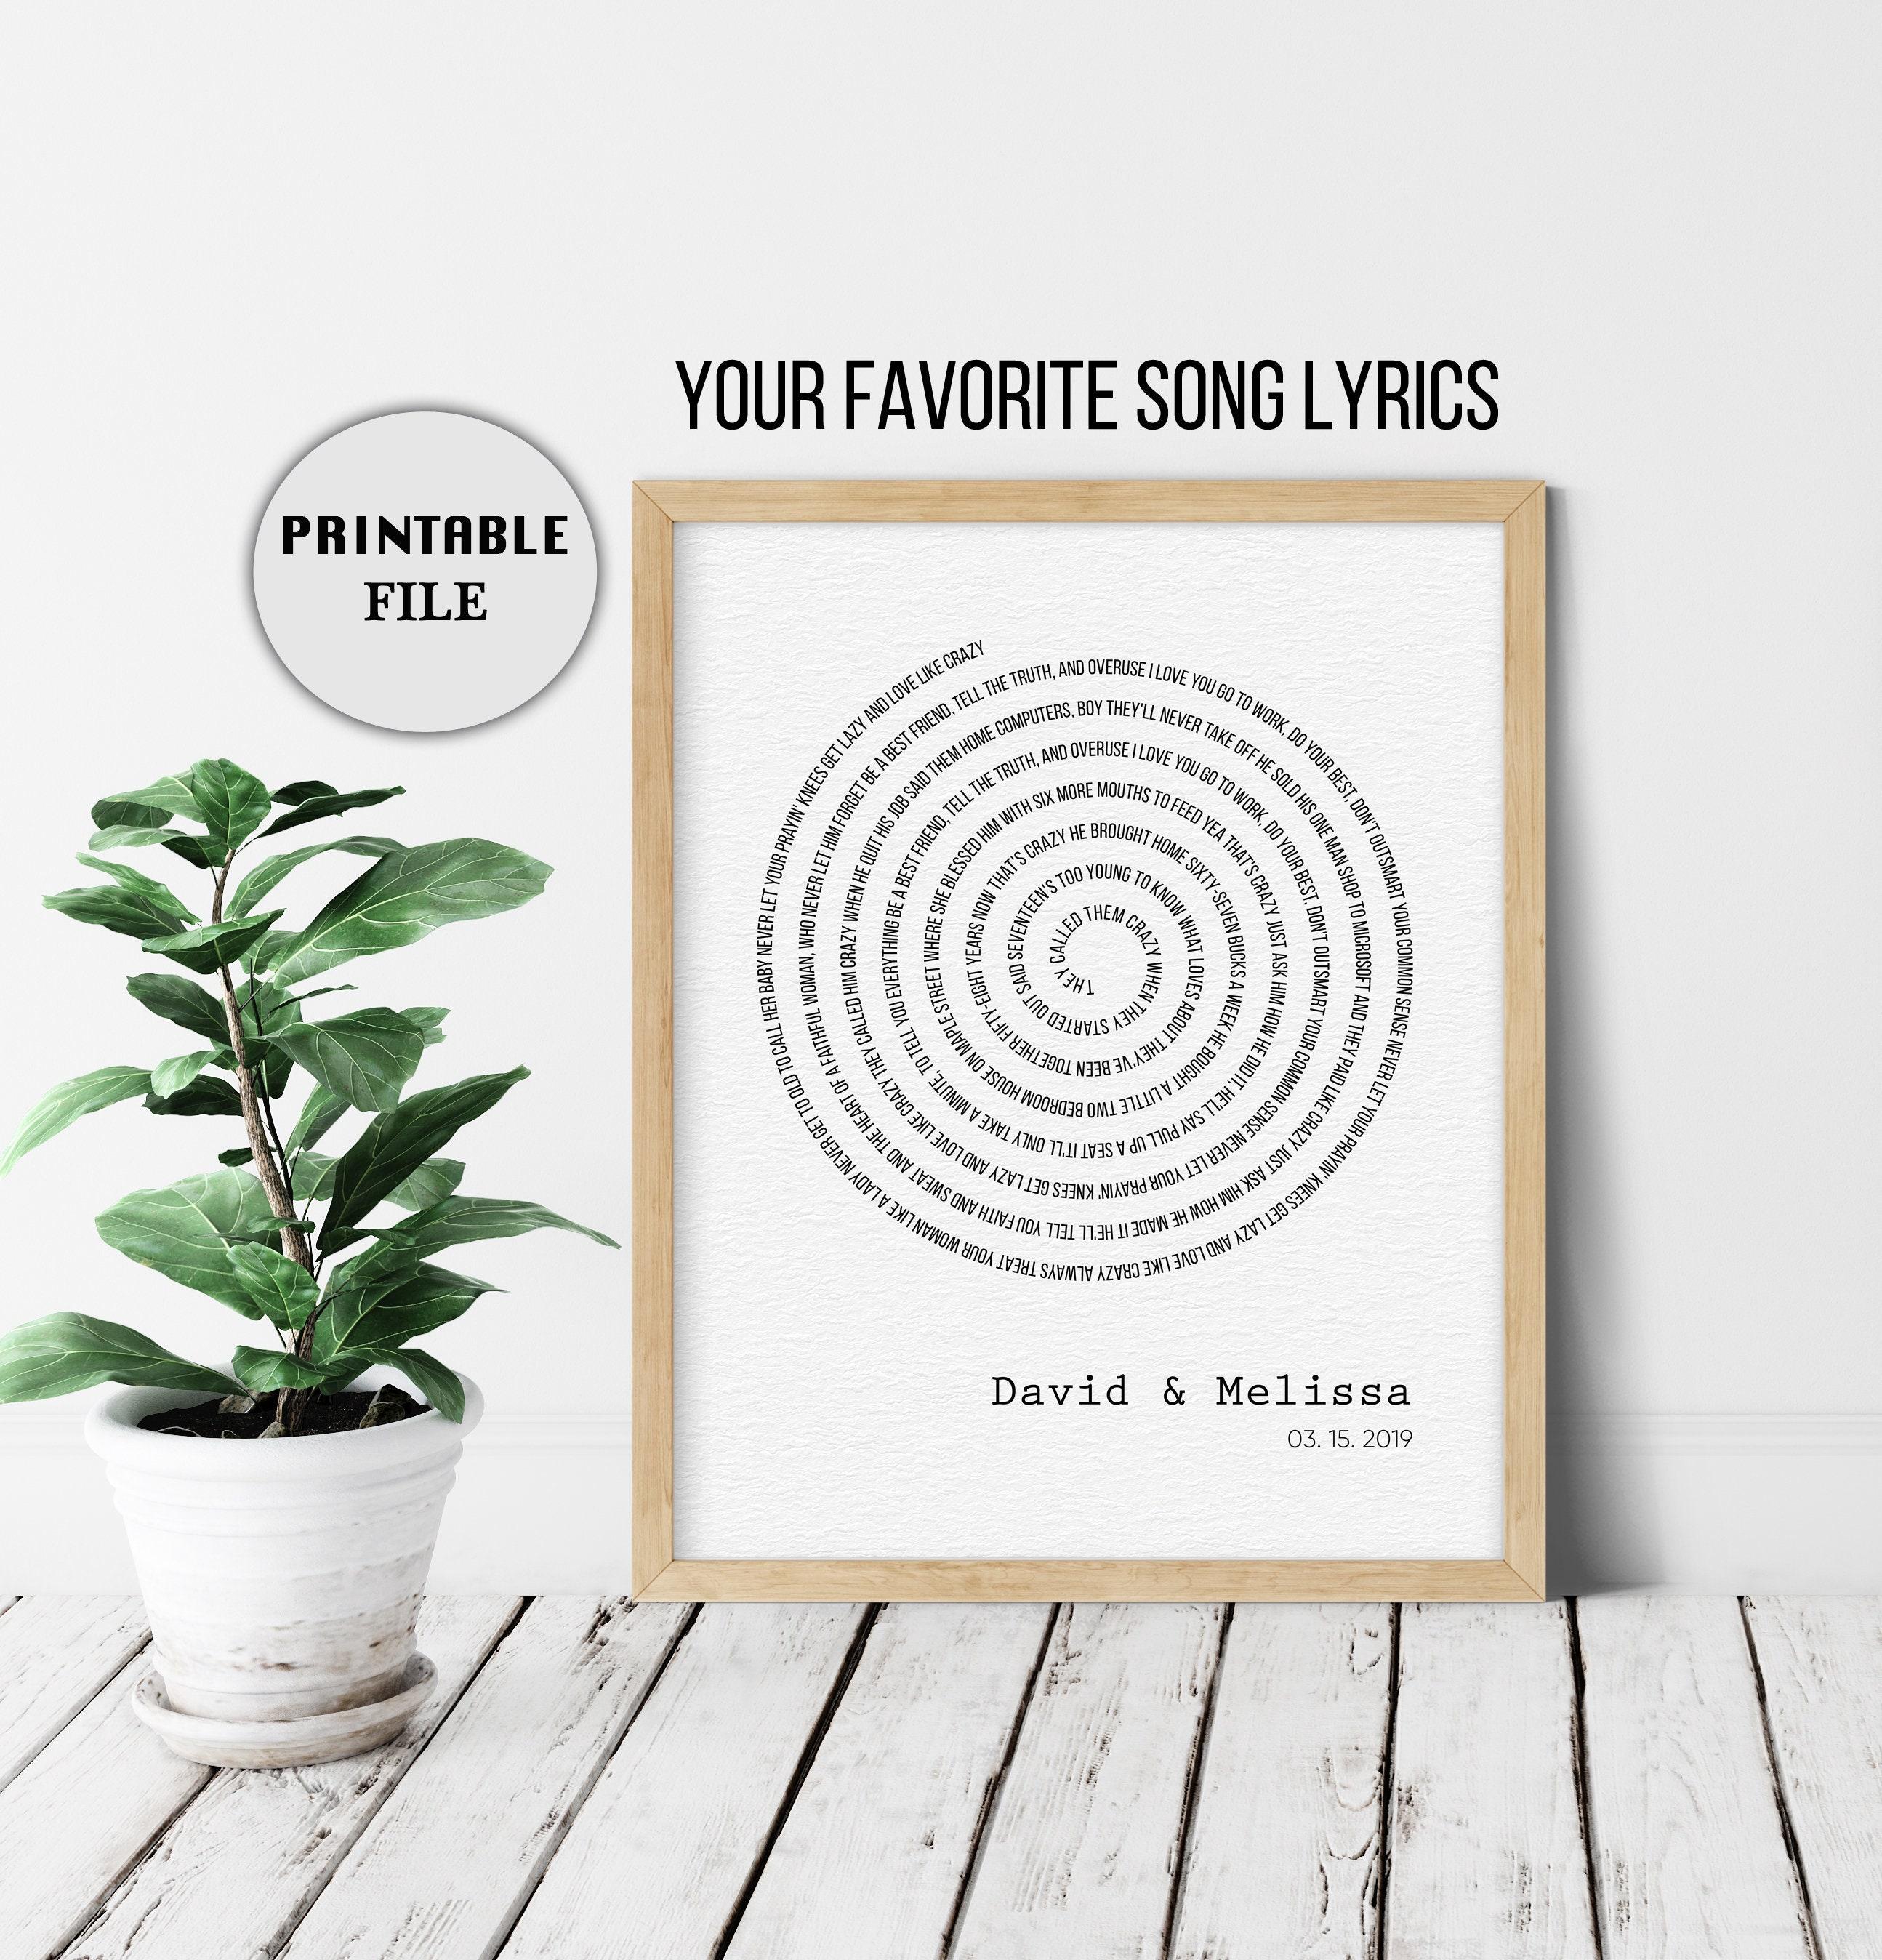 1st Anniversary Gift for Husband, Custom Spiral Song Lyrics, Paper  Anniversary Gift for Him, Lyric Wall Art, Any Song Lyrics, PRINTABLE